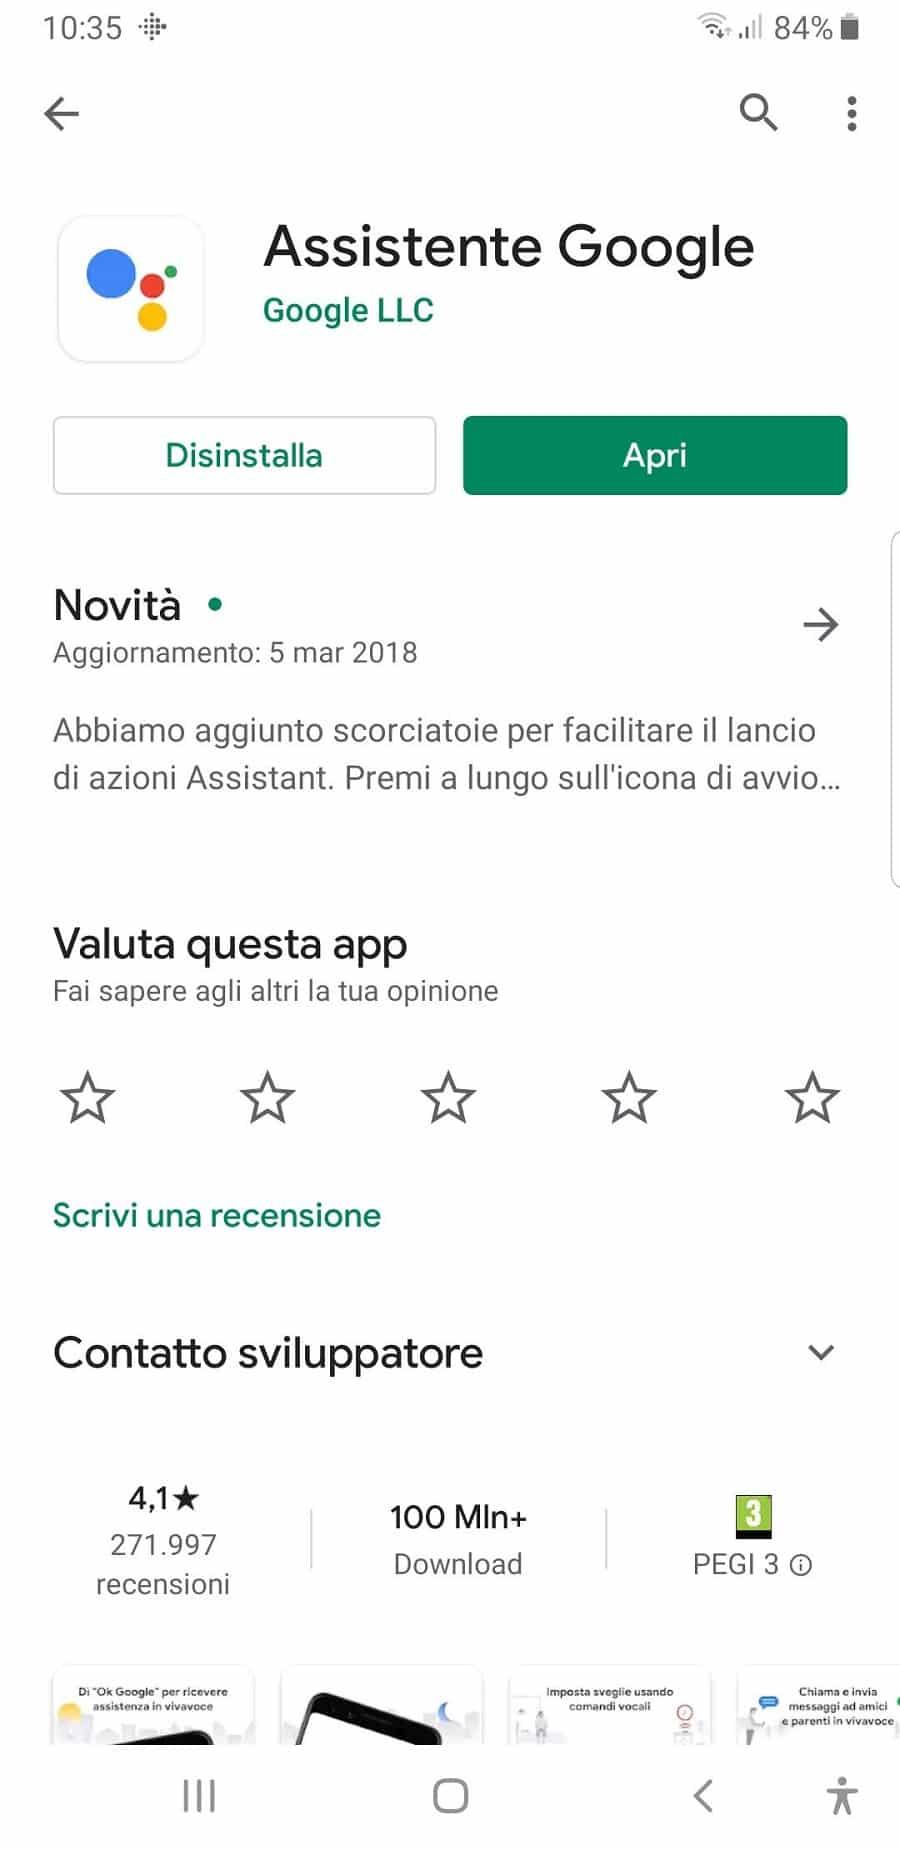 Sostituire Samsung Bixby con Assistente Google